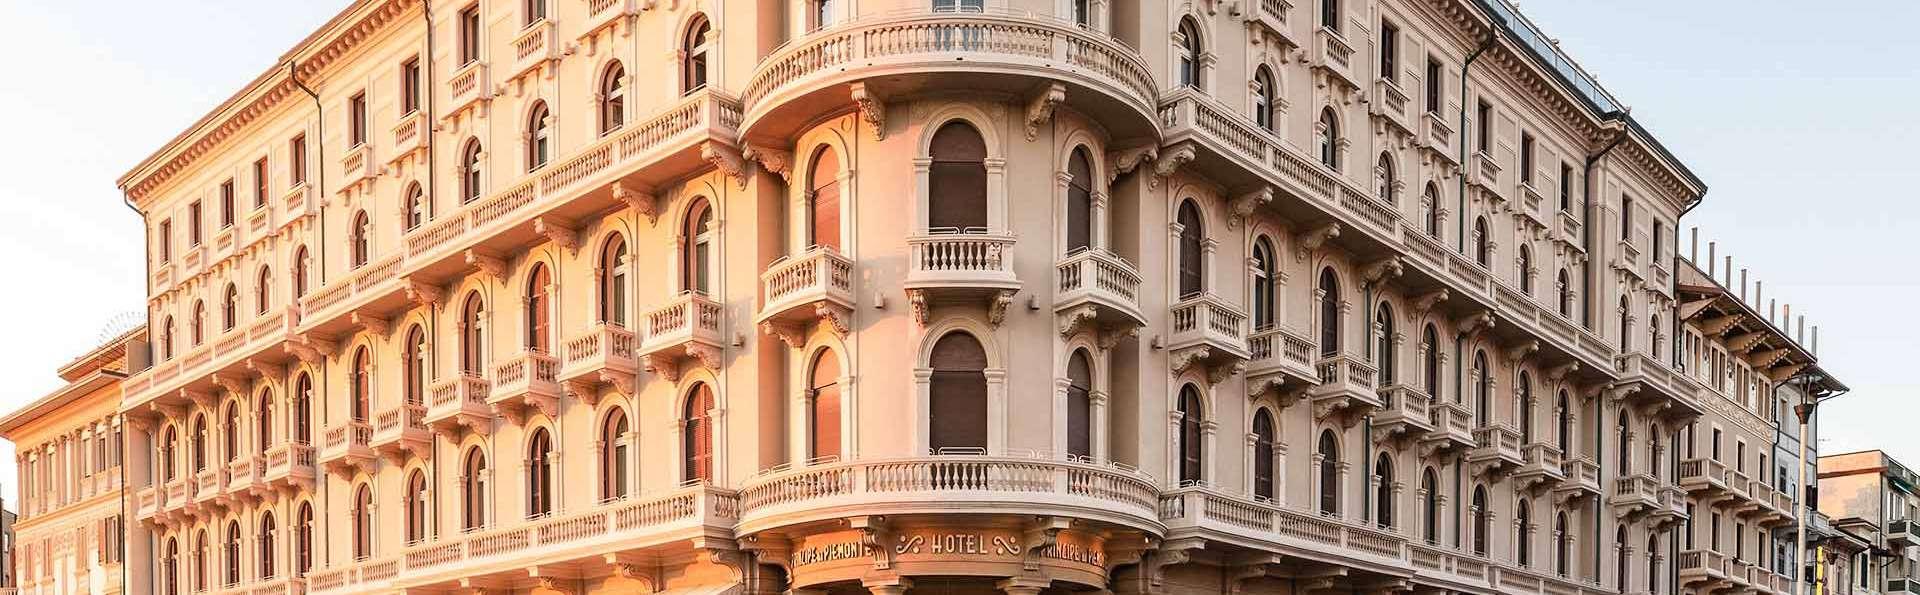 Grand Hotel Principe di Piemonte - EDIT_facciata_01.jpg